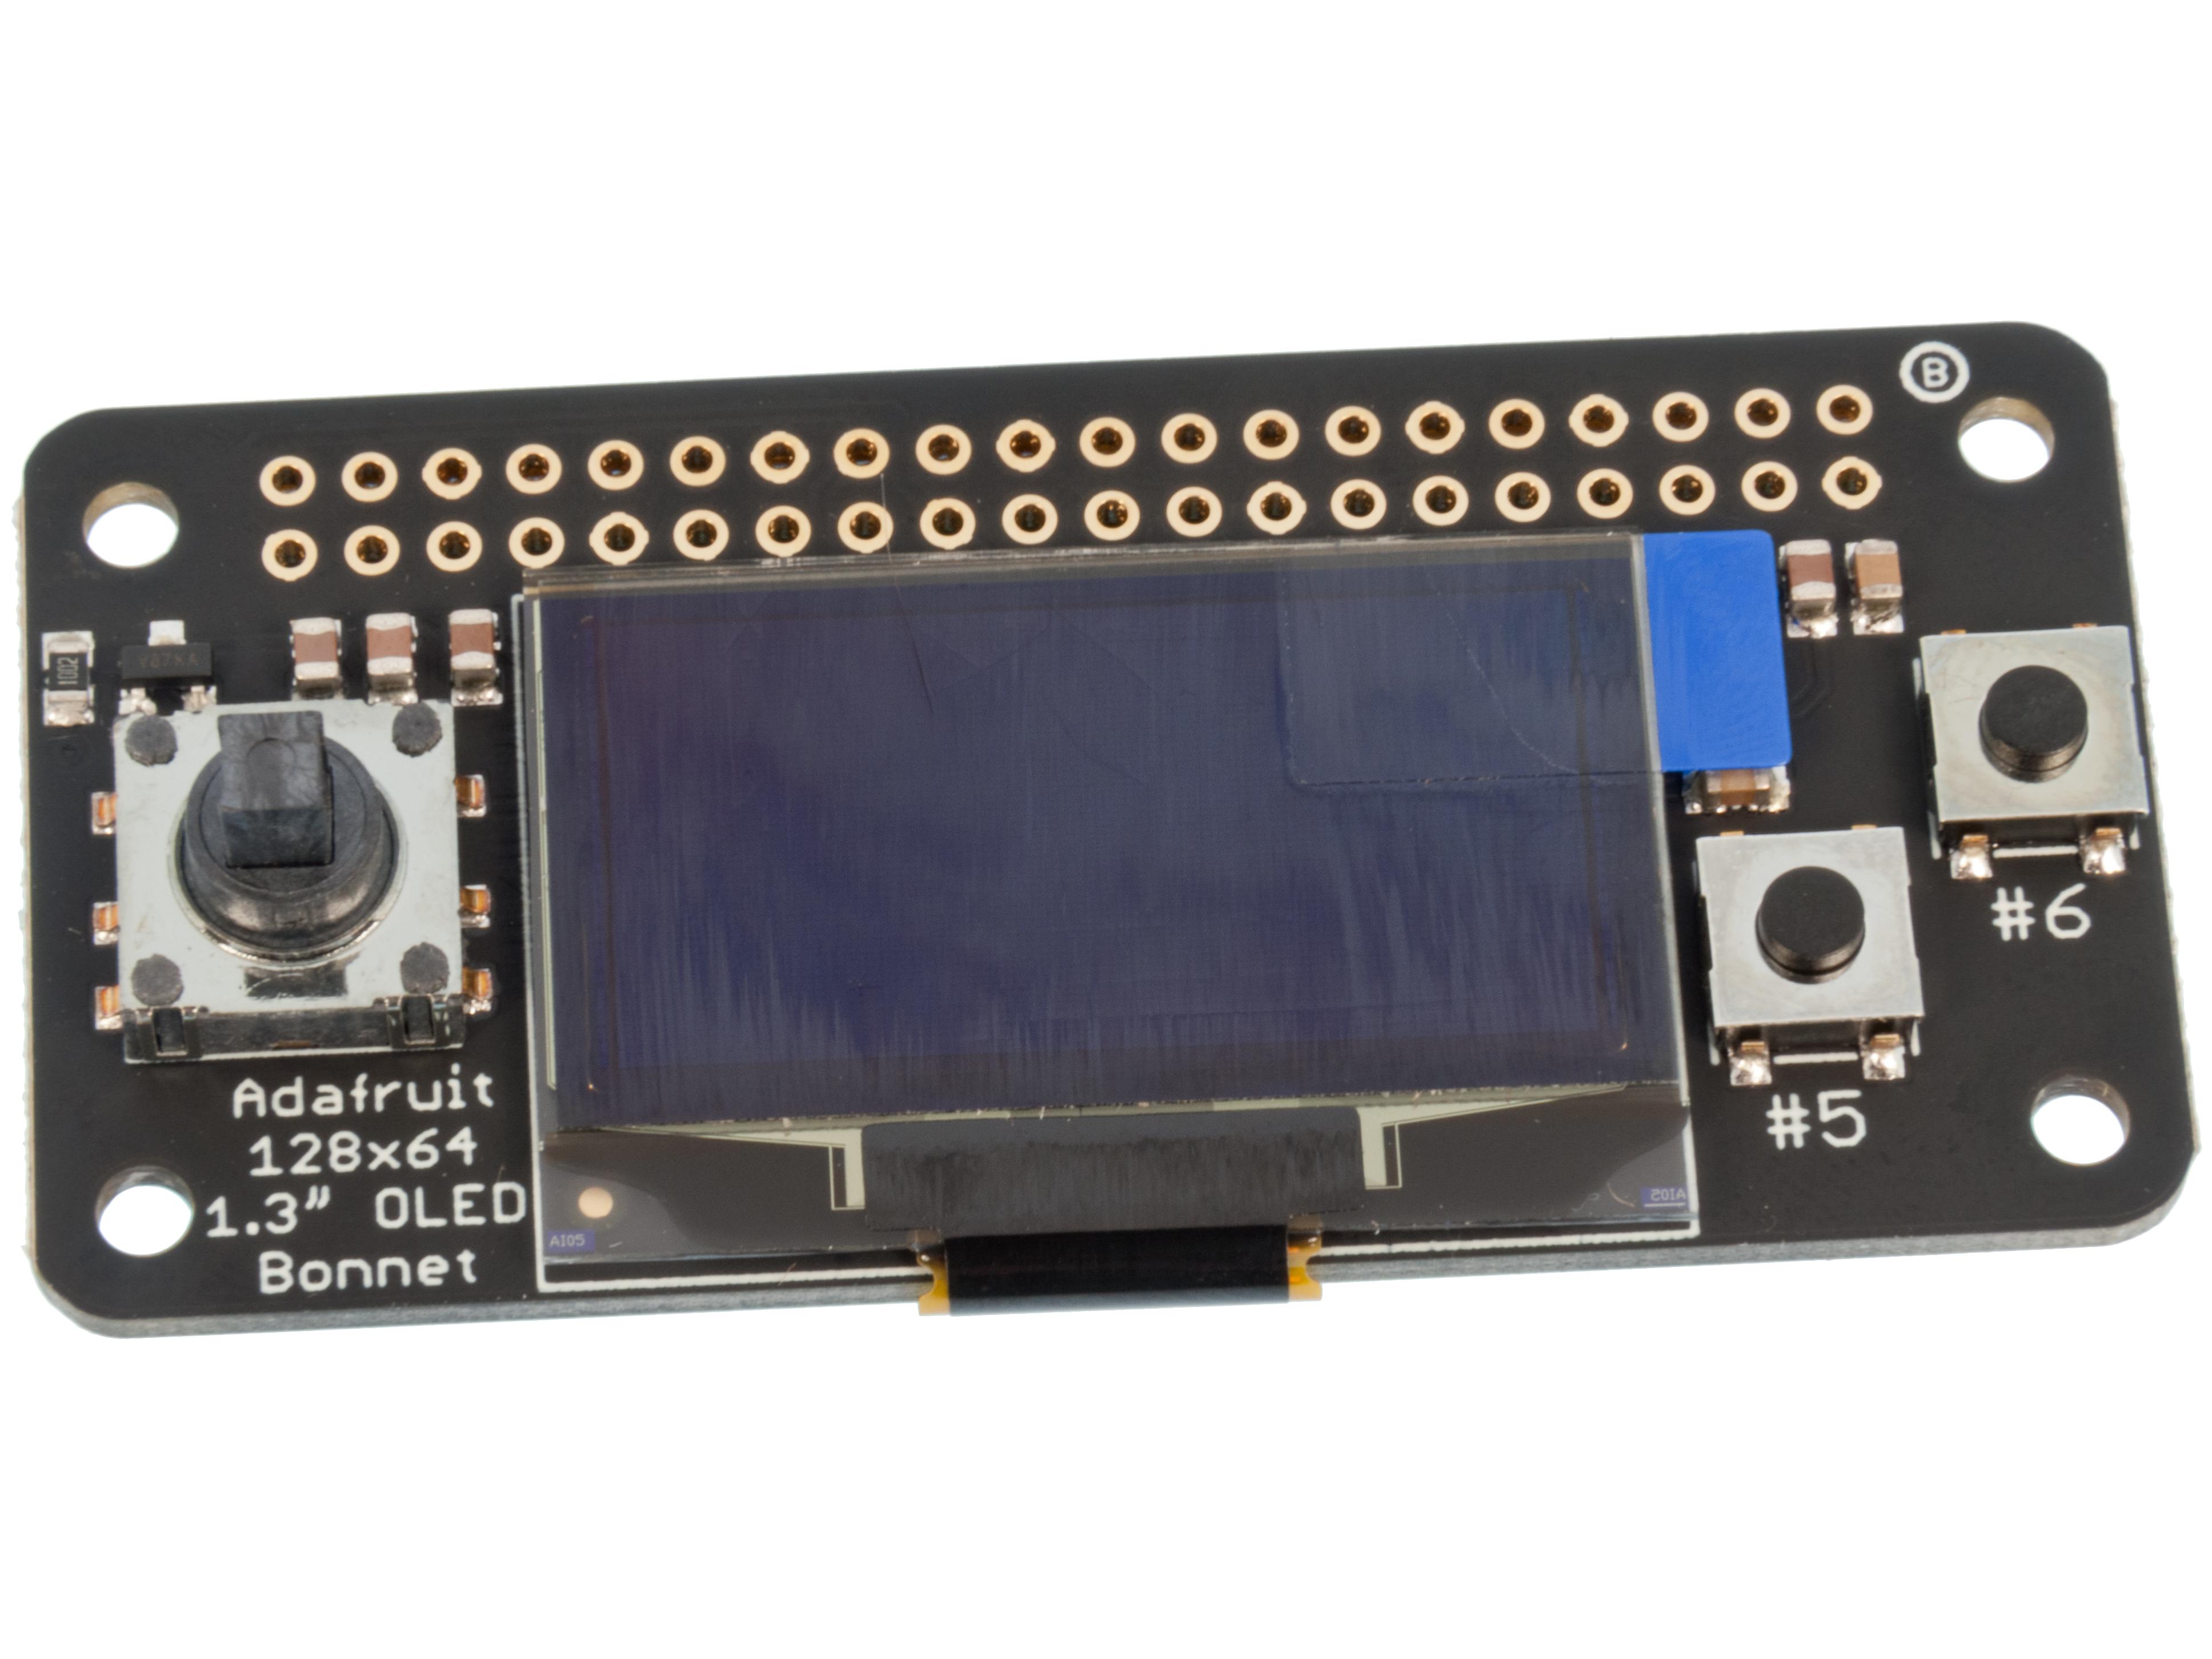 Adafruit 128x64 OLED för Pi Zero